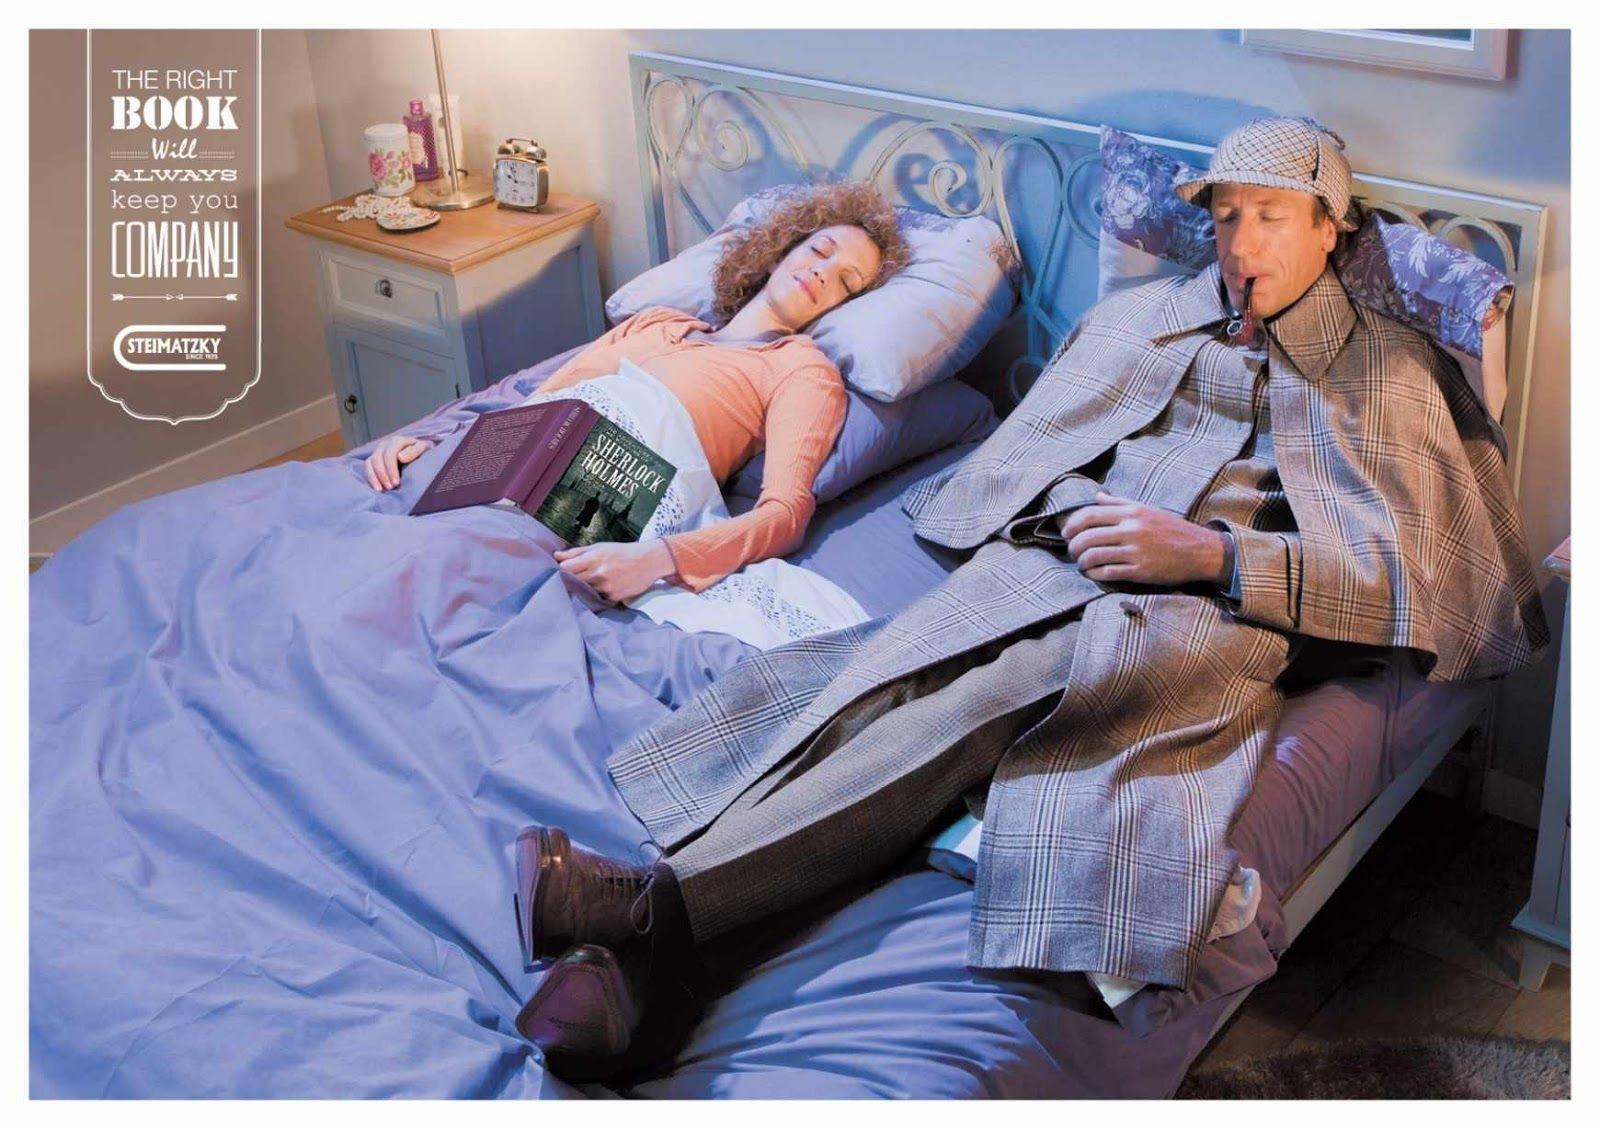 What to Do with Too Many Sherlock Holmes Books? - I Hear of Sherlock Everywhere